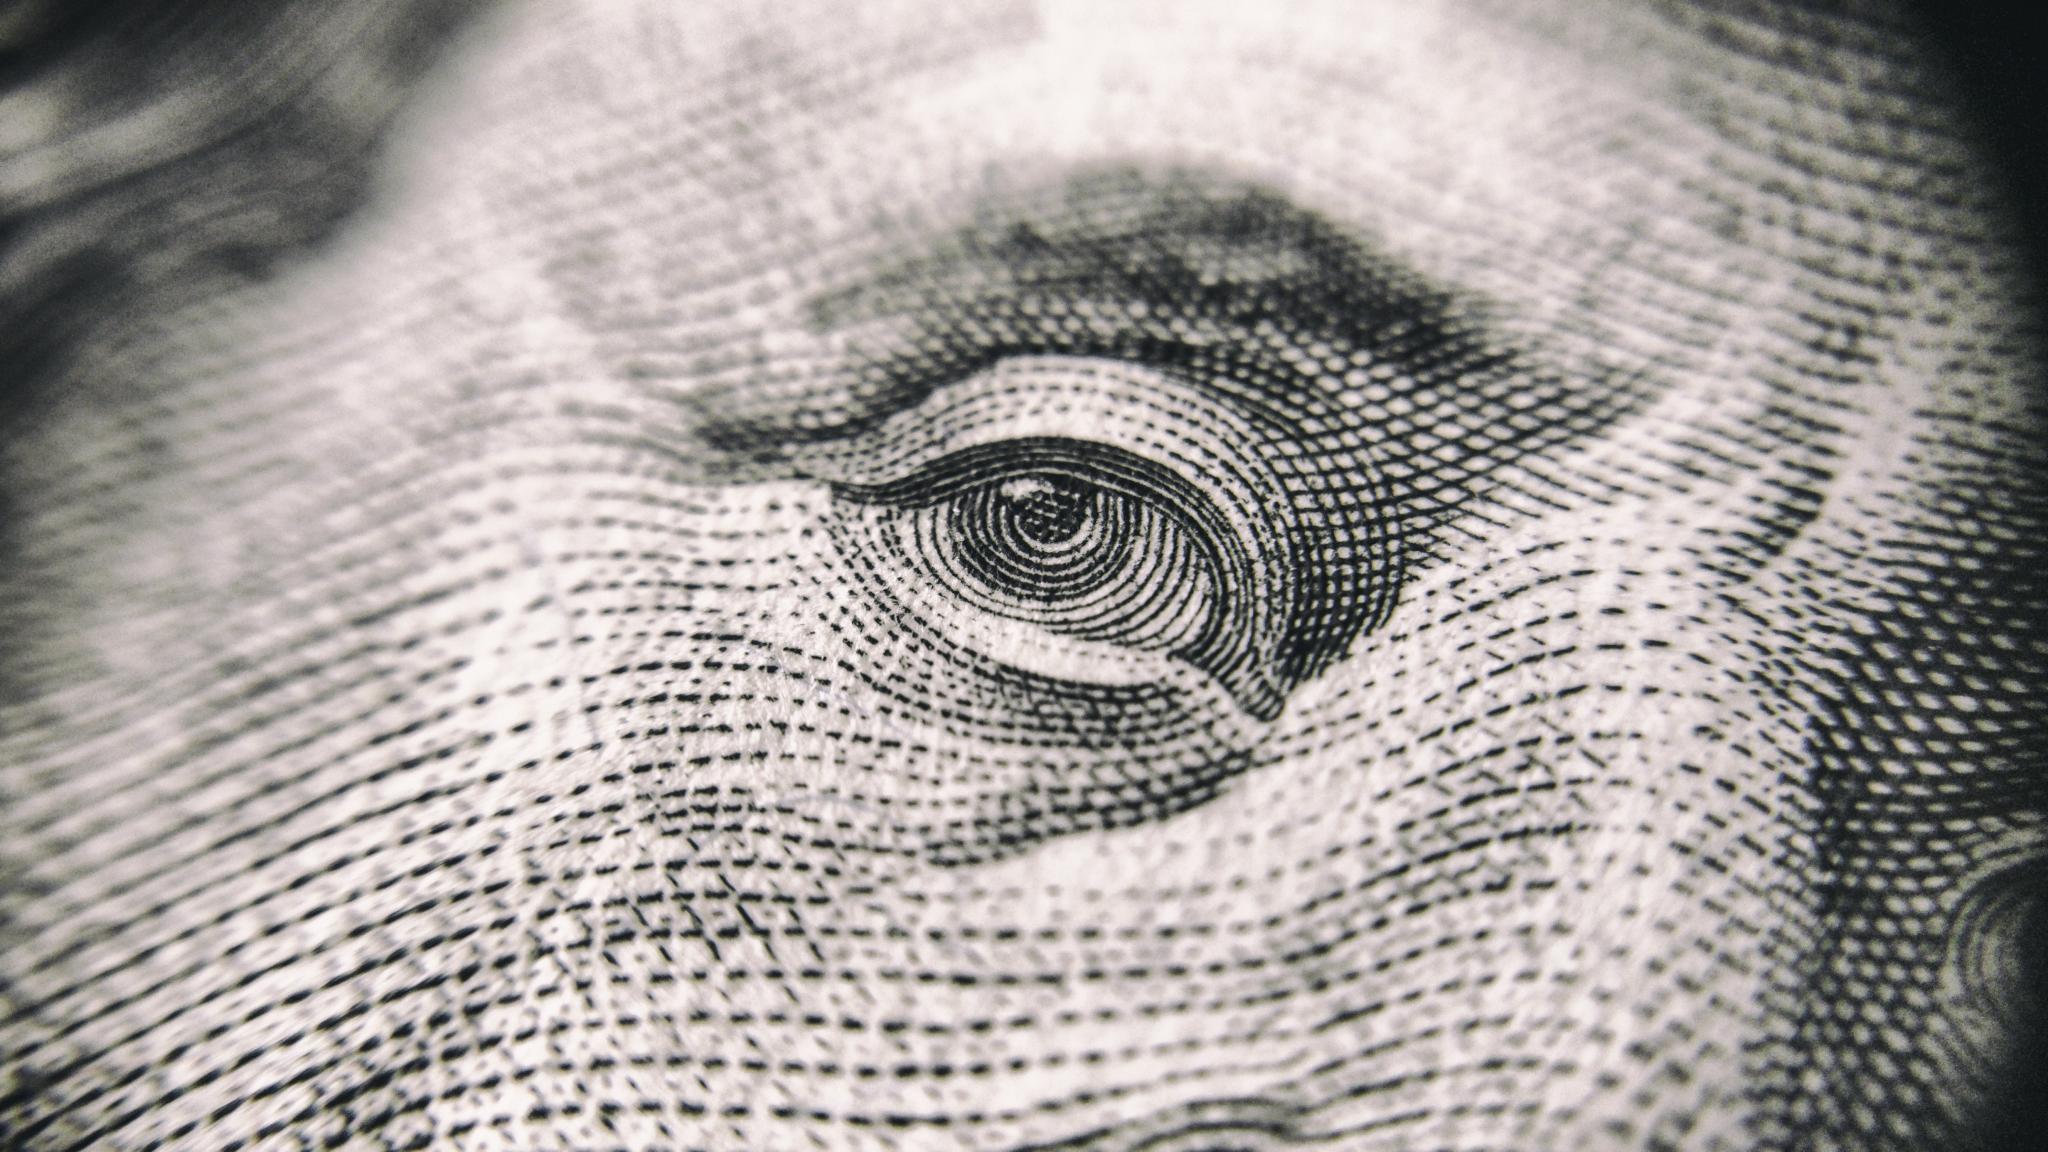 closeup of Benjamin Franklin's eye on 100 dollar bill